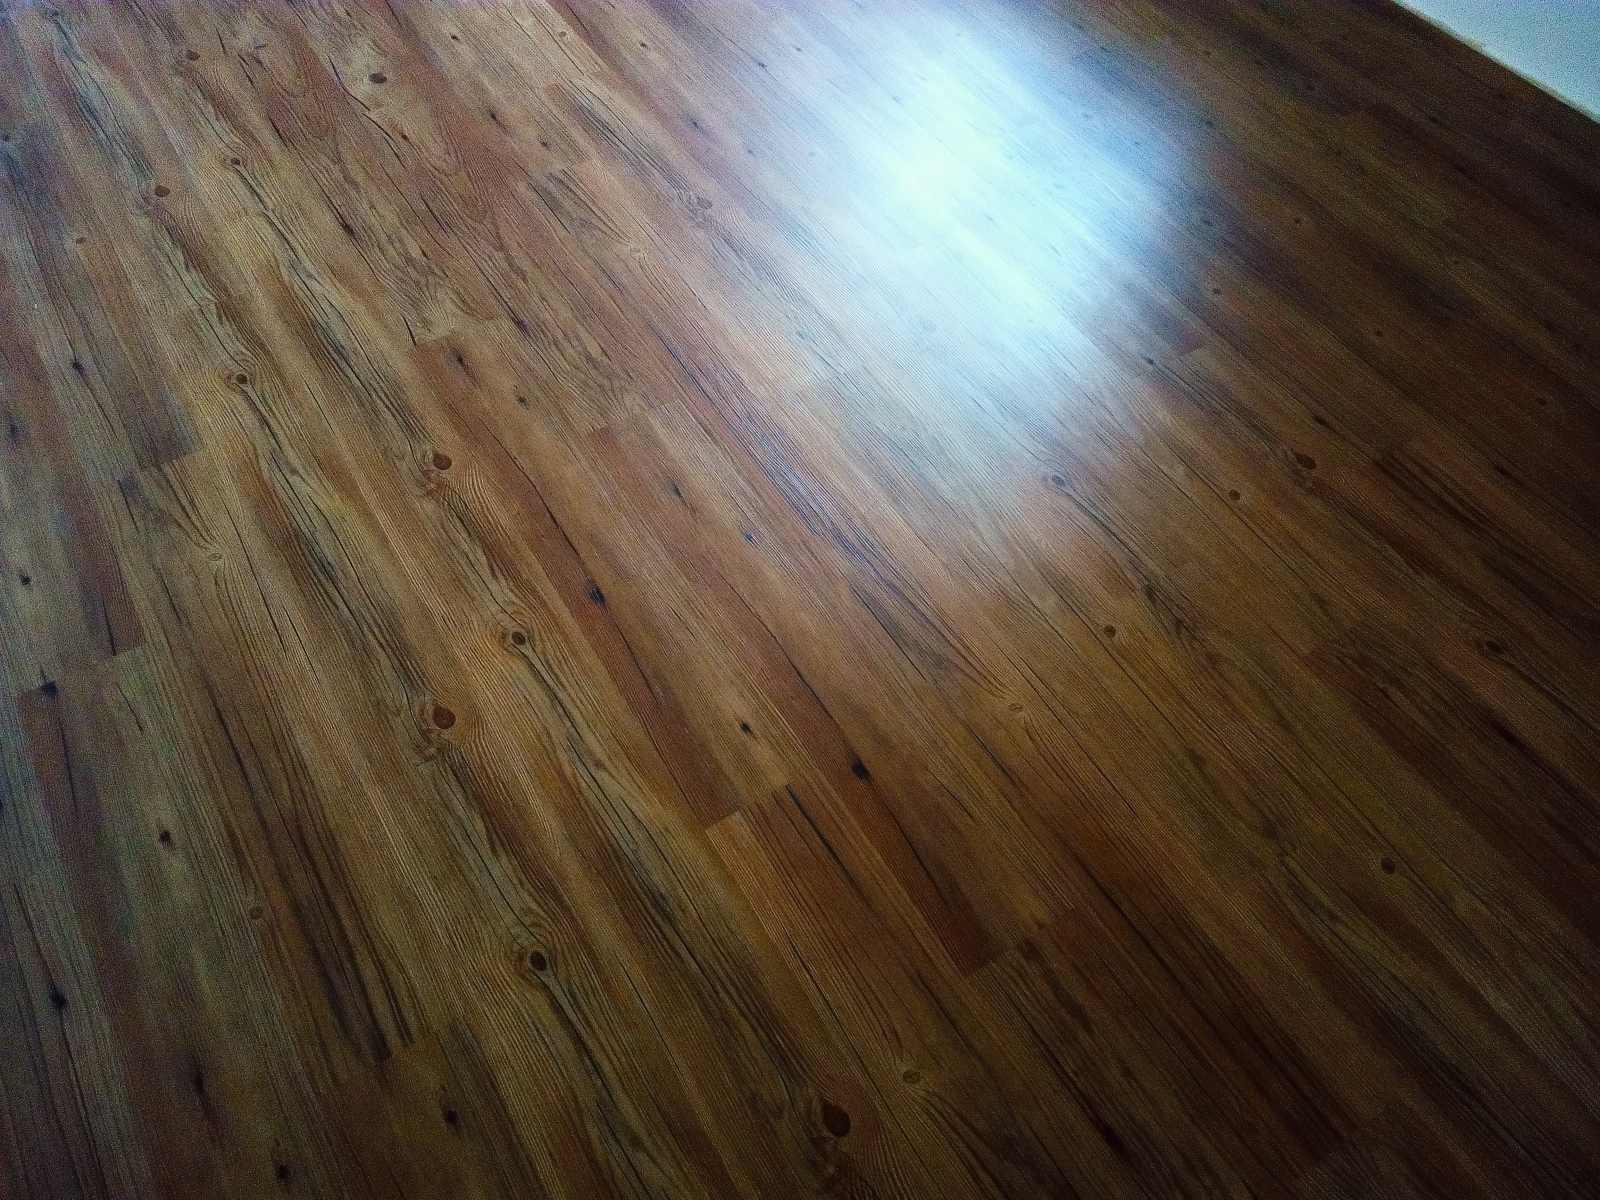 Vinylová podlaha v RD